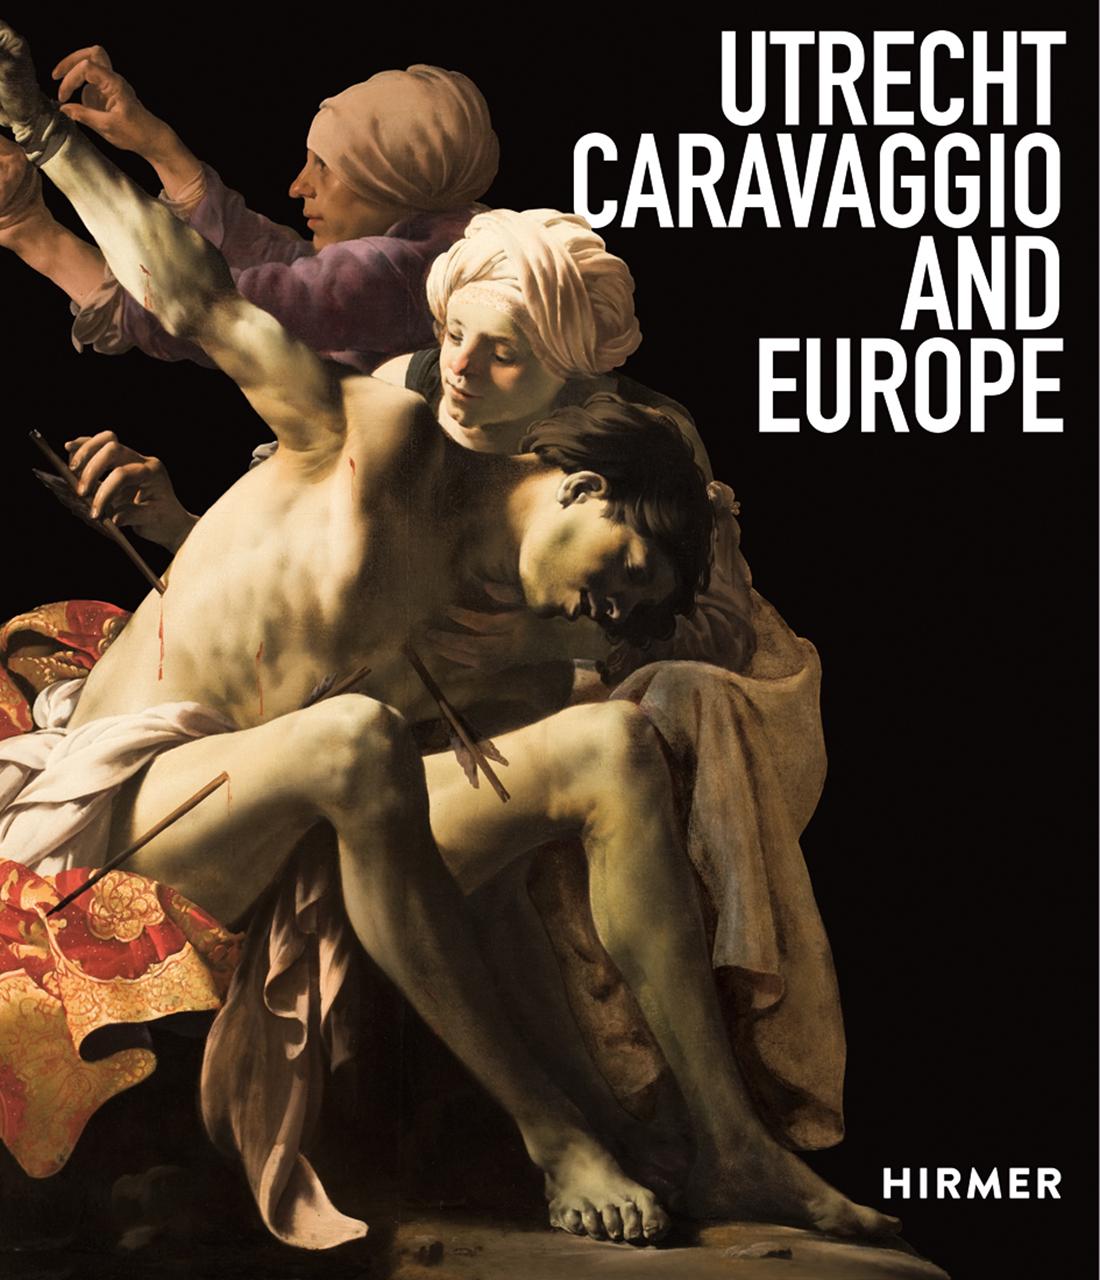 Utrecht, Caravaggio, and Europe